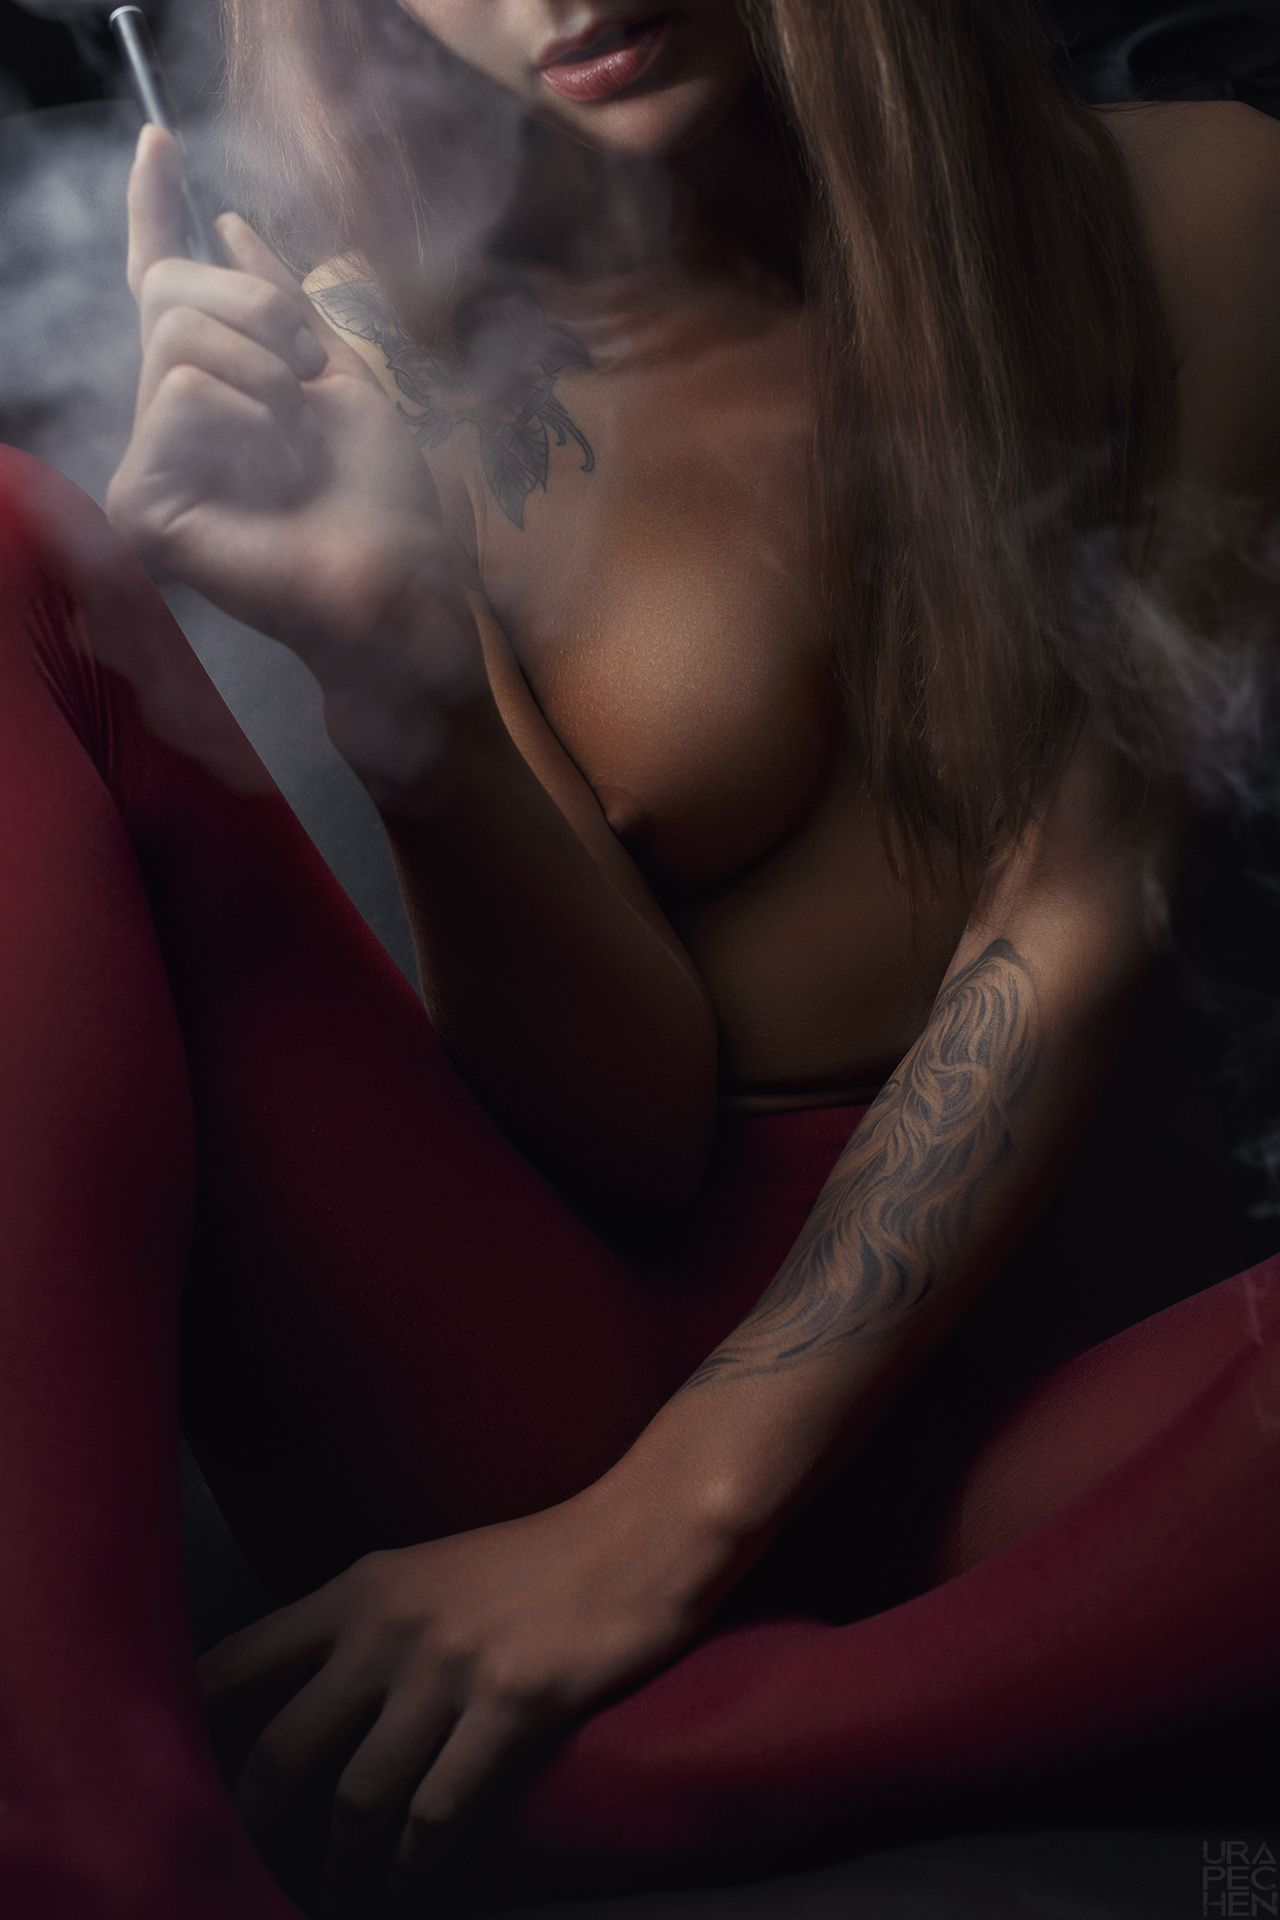 random erotic